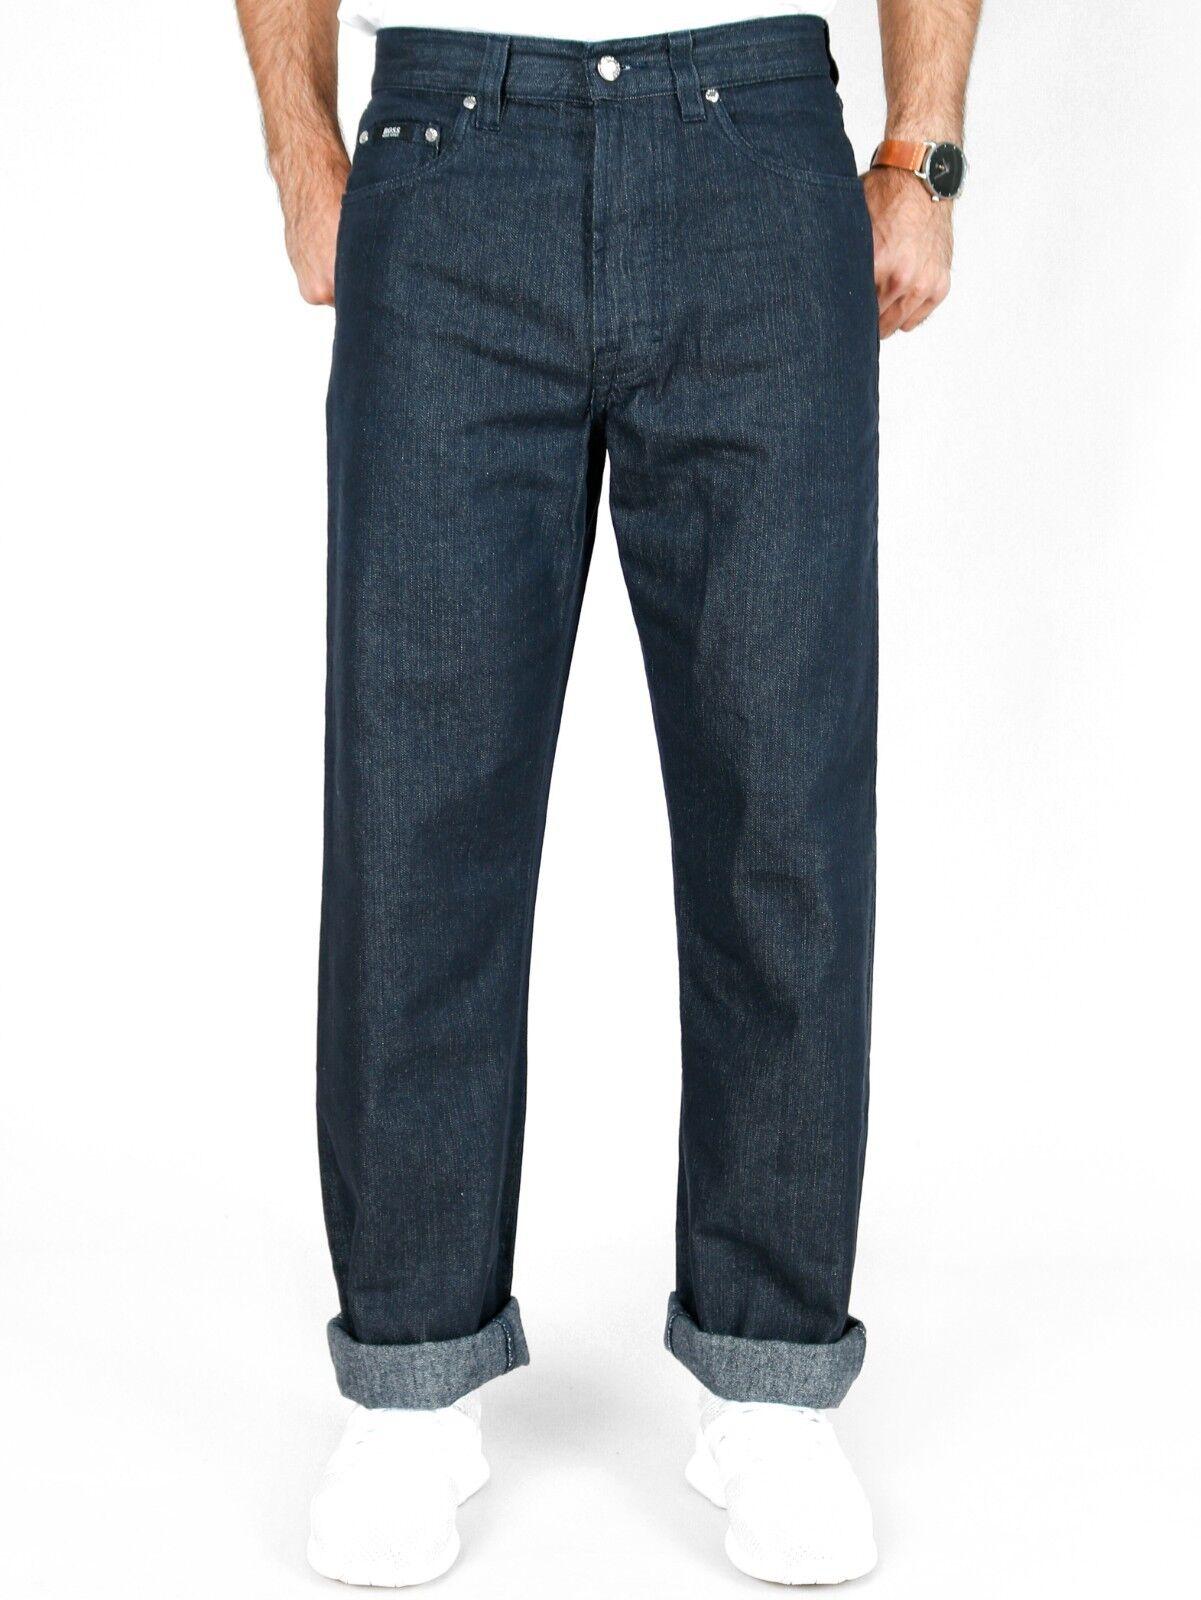 c6ccadc5a800a1 ... Stretch Comfort Jeans hoher Bund Hose. Hugo Boss - Herren Stoff-Hose -  Alabama Comfort Fit - Hoher Bund - W28